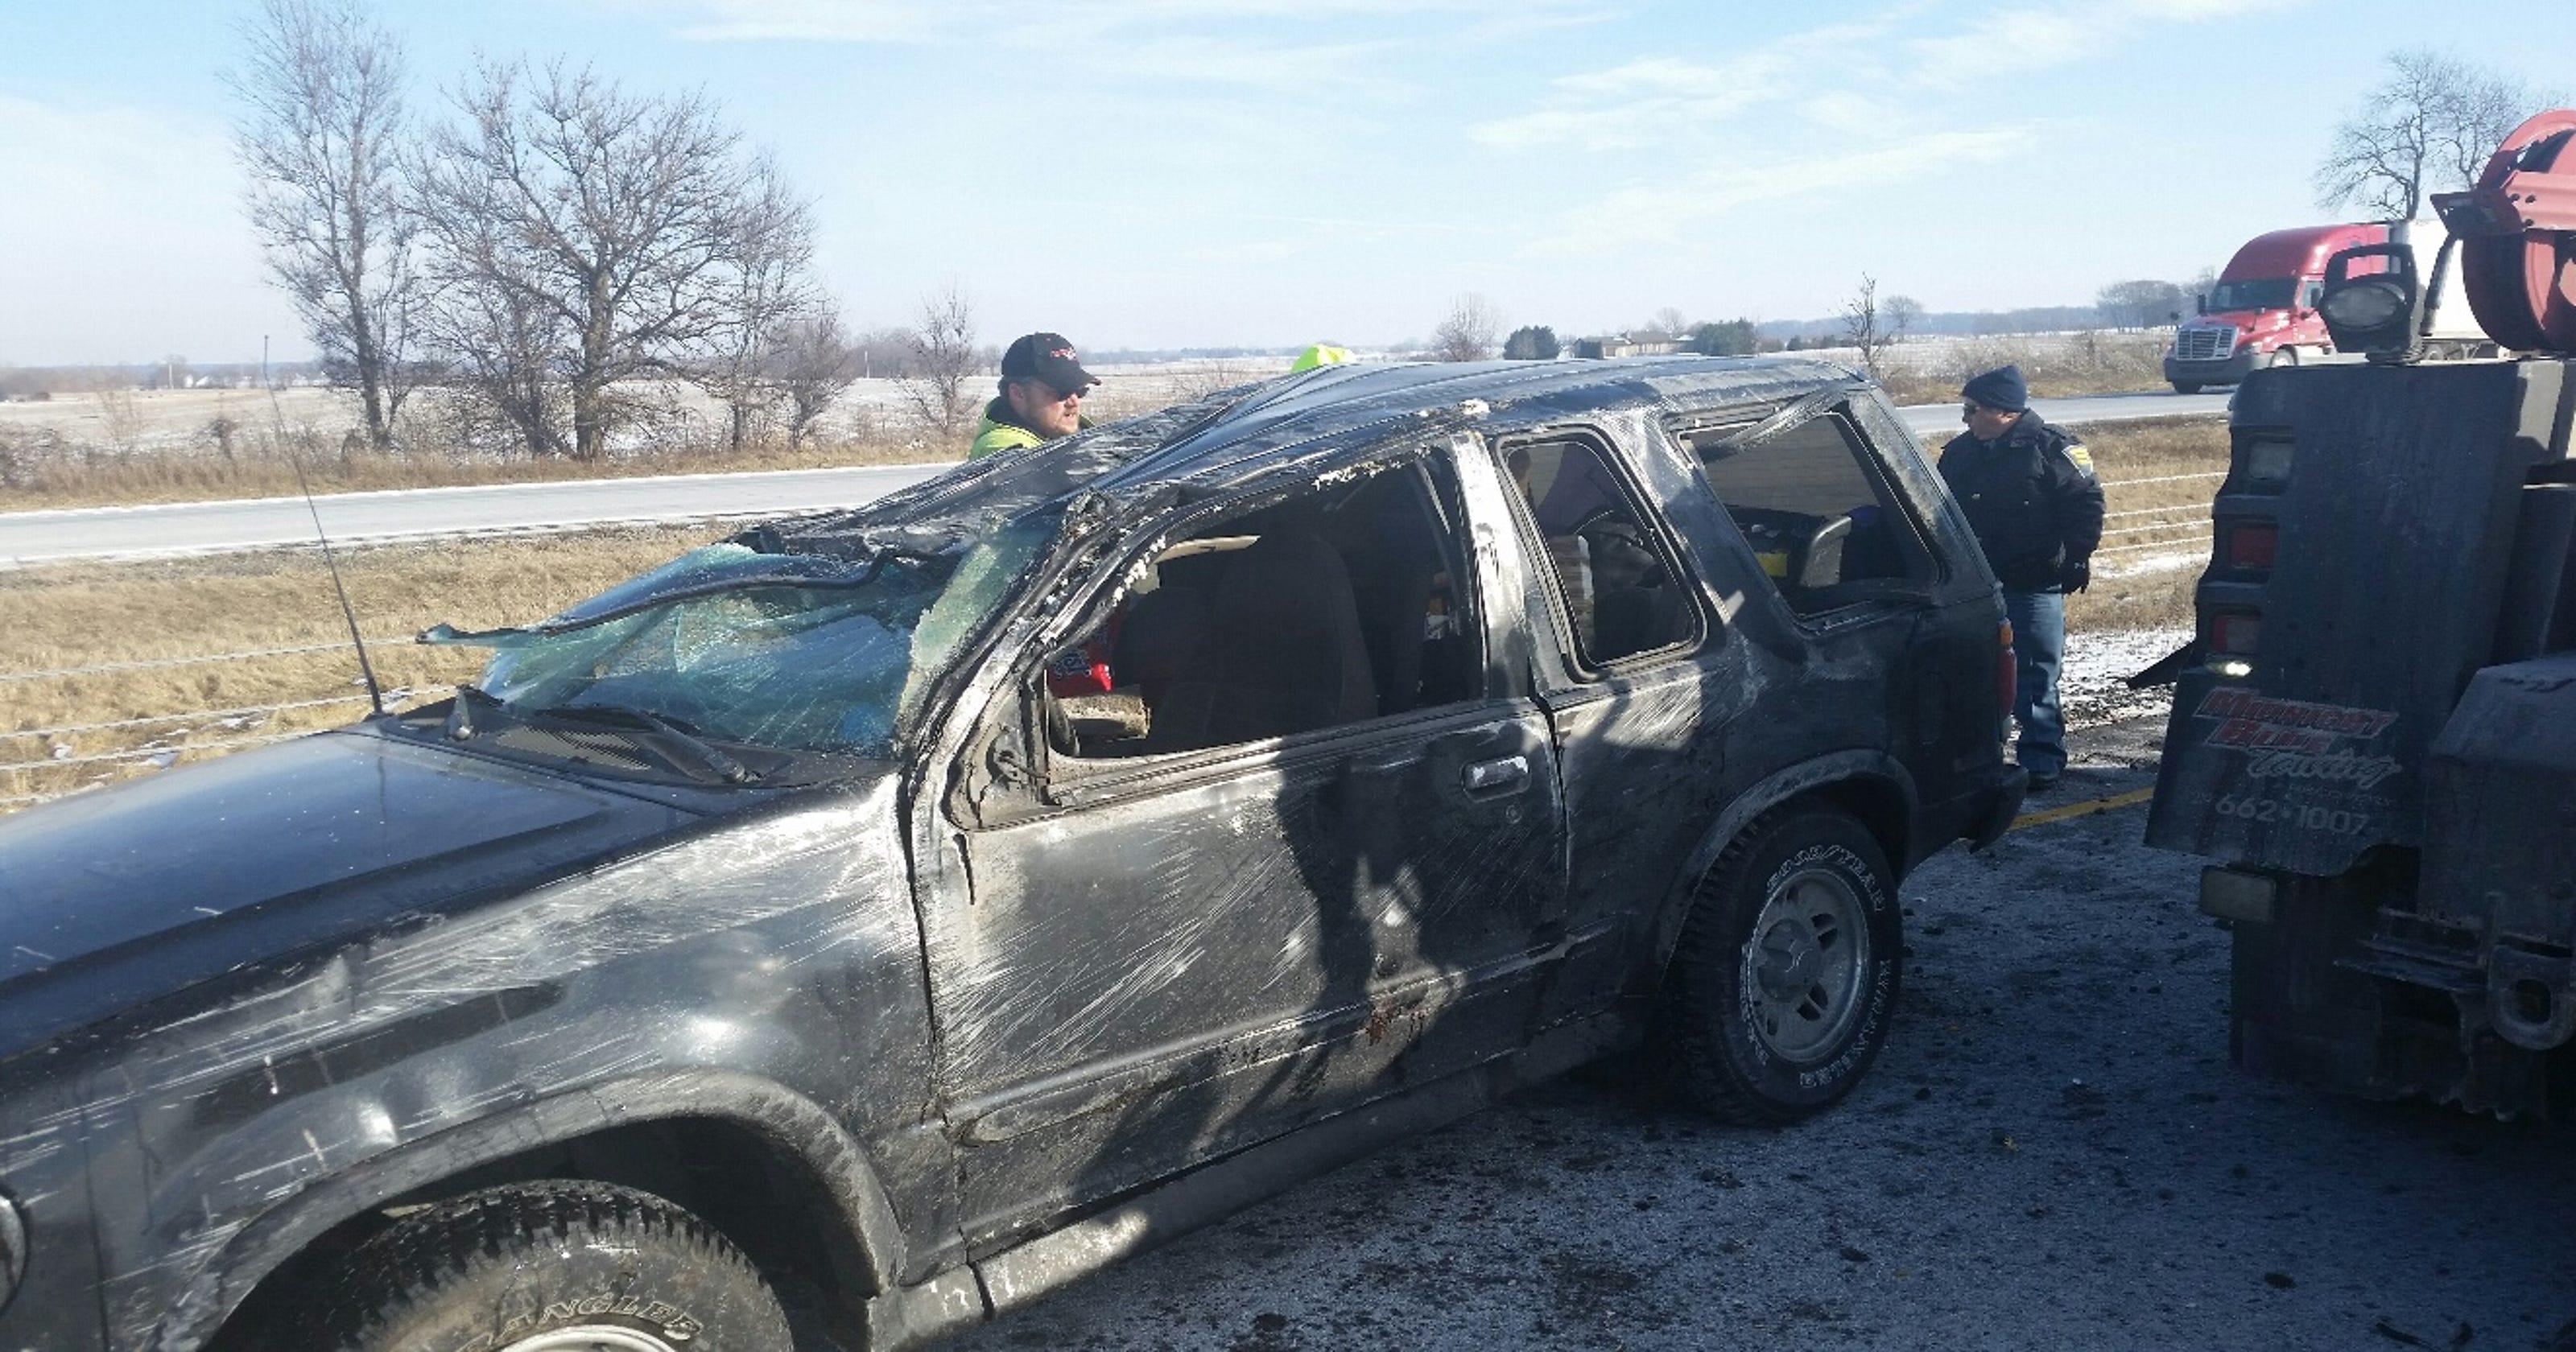 Indianapolis man dies in Lake County crash